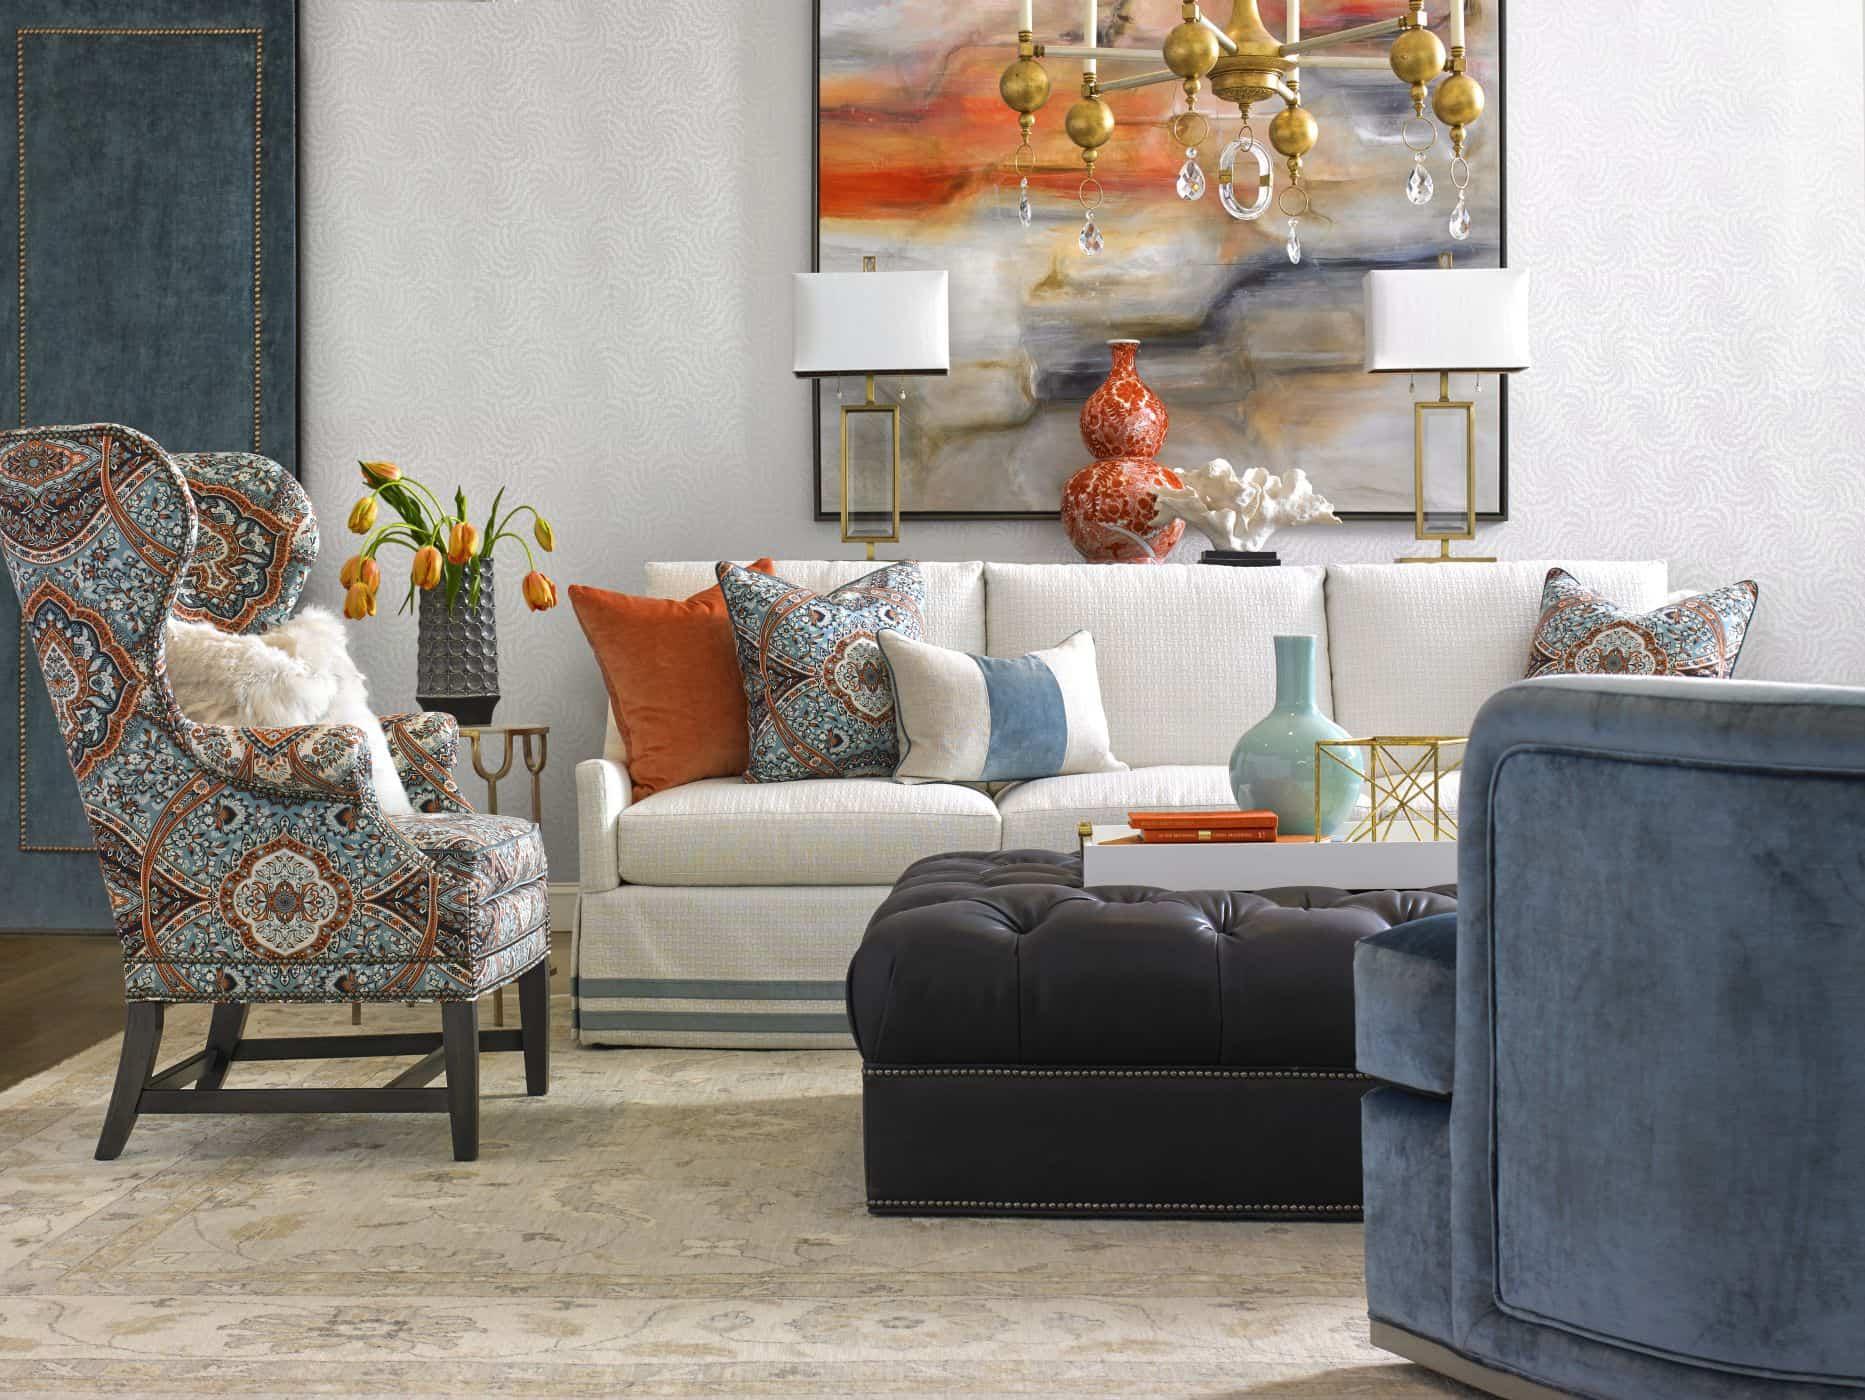 representatives ideas sales interior products set design home